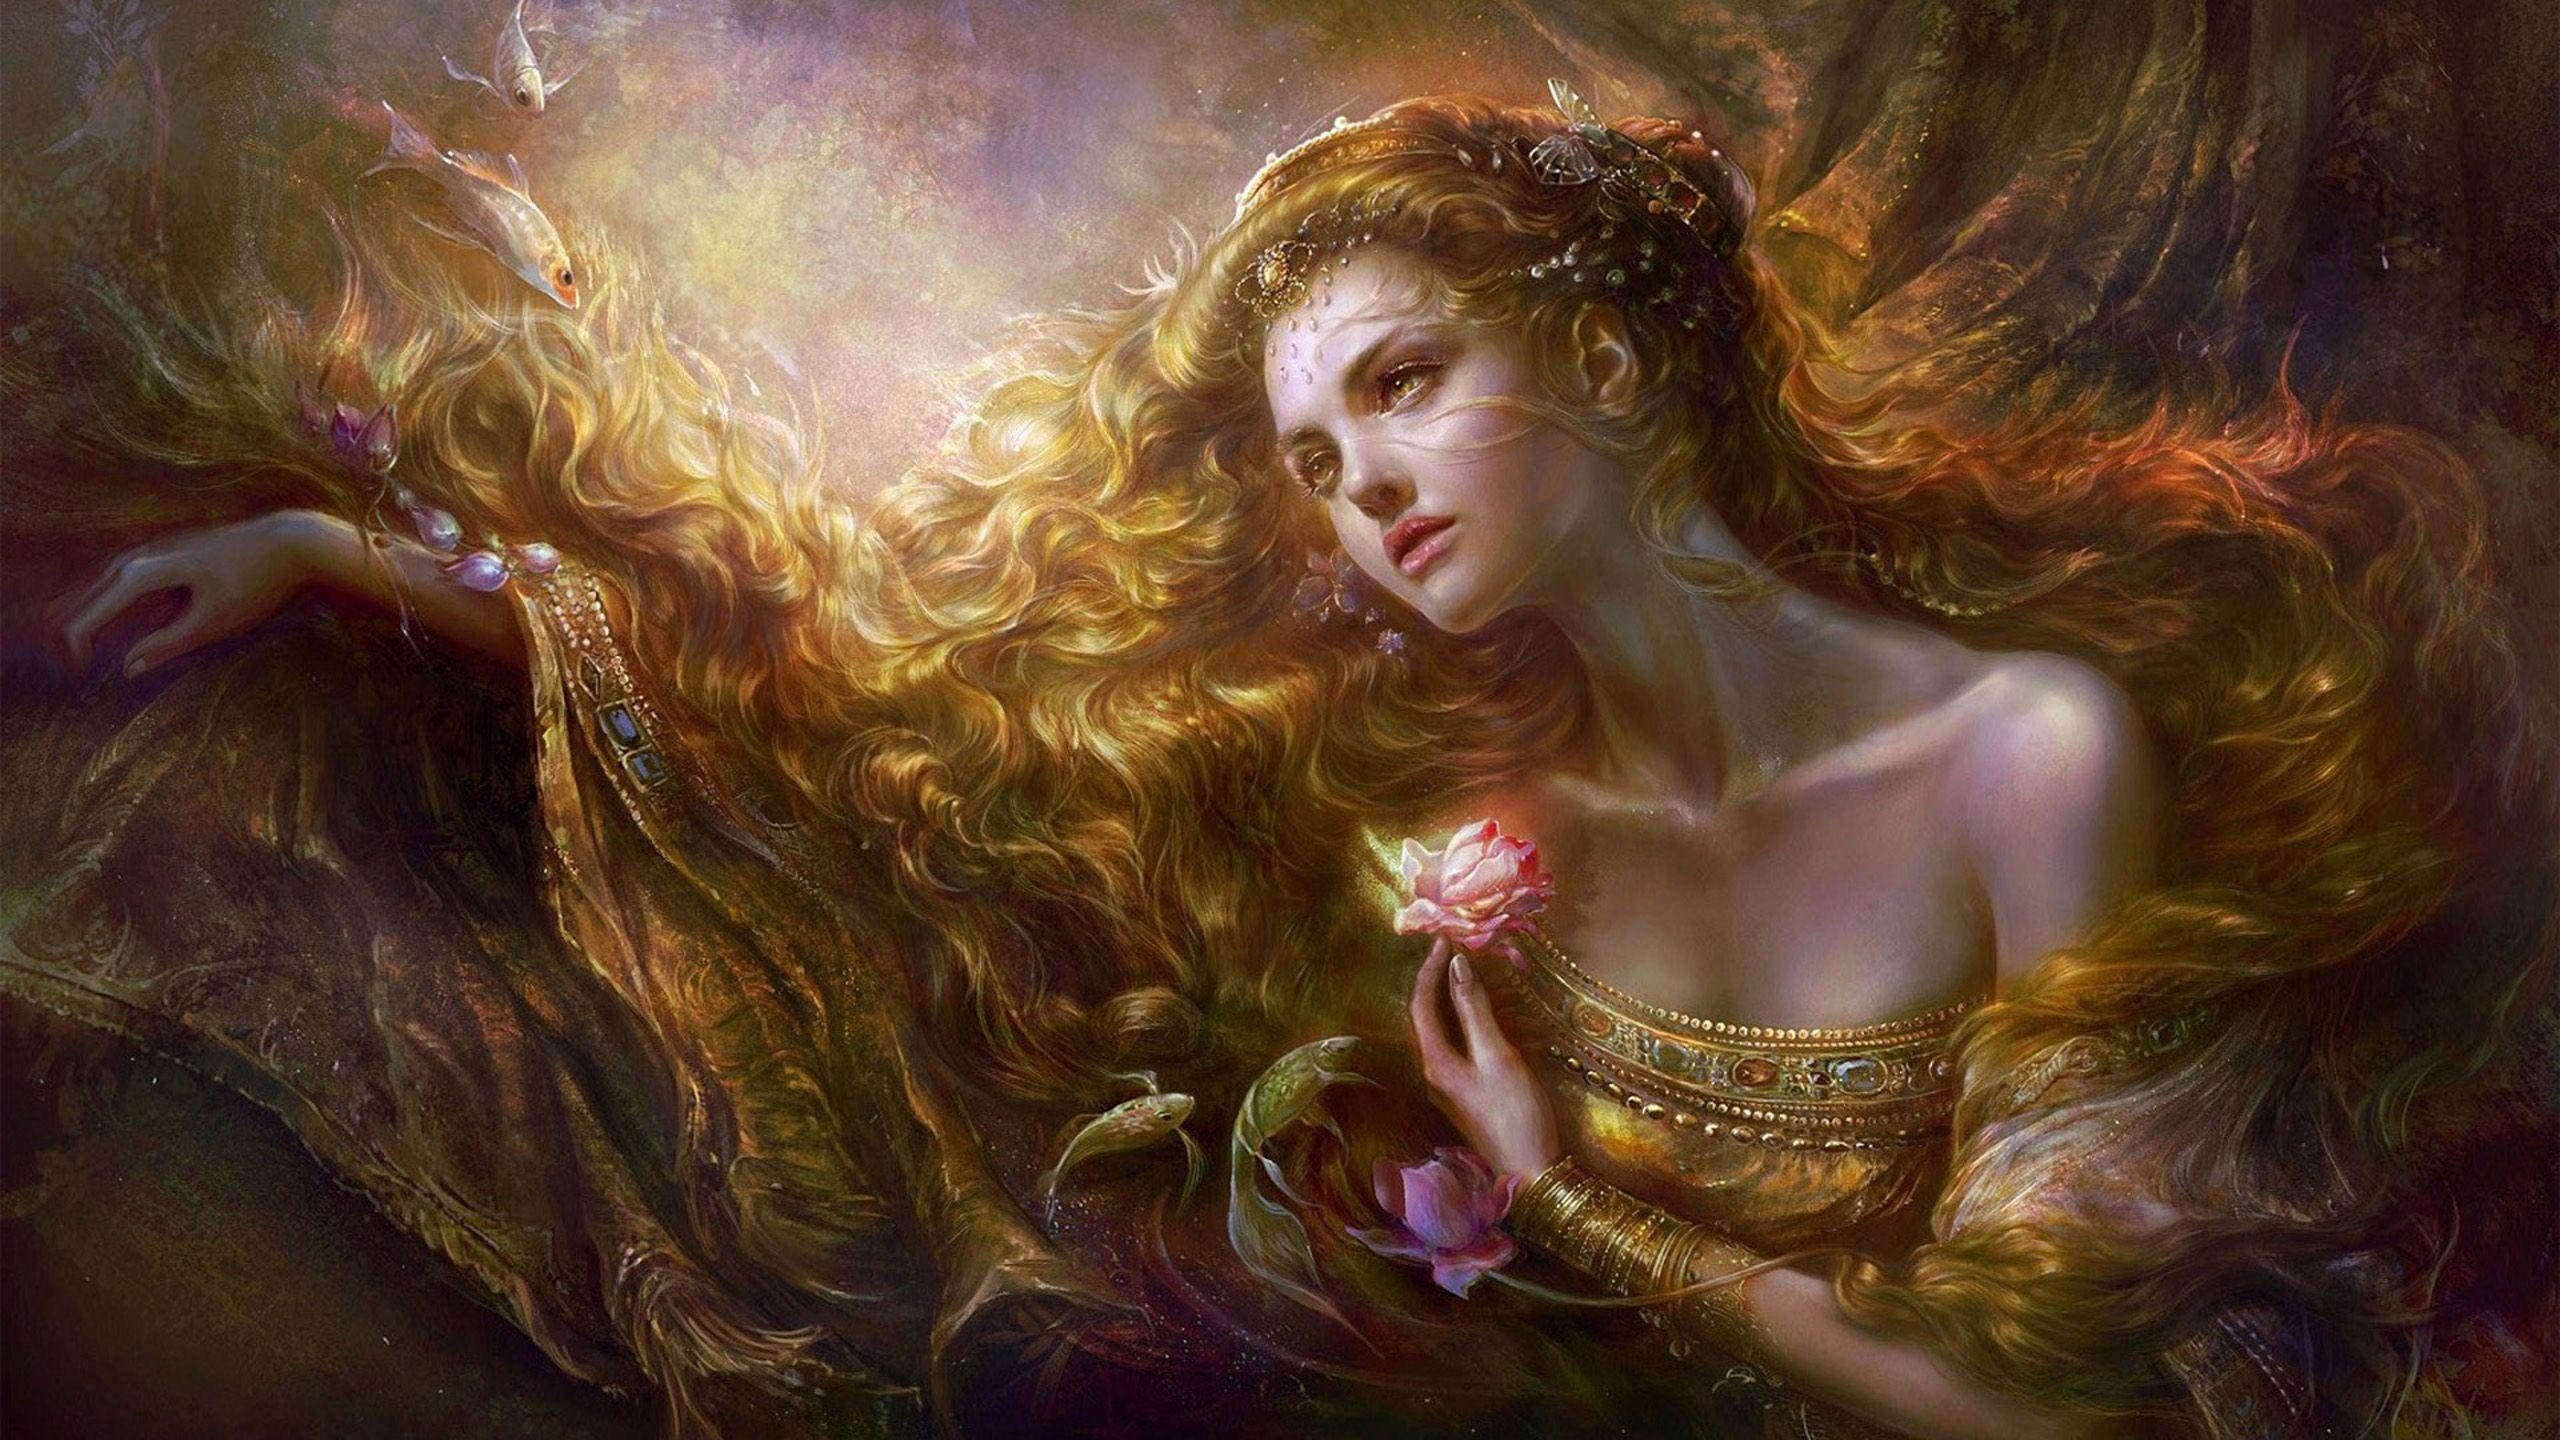 Beautiful Goddess Wallpapers Hd 2560x1440 Jpg 2560 1440 Fantasias De Sereia Garota Fantasia Wallpaper De Fadas